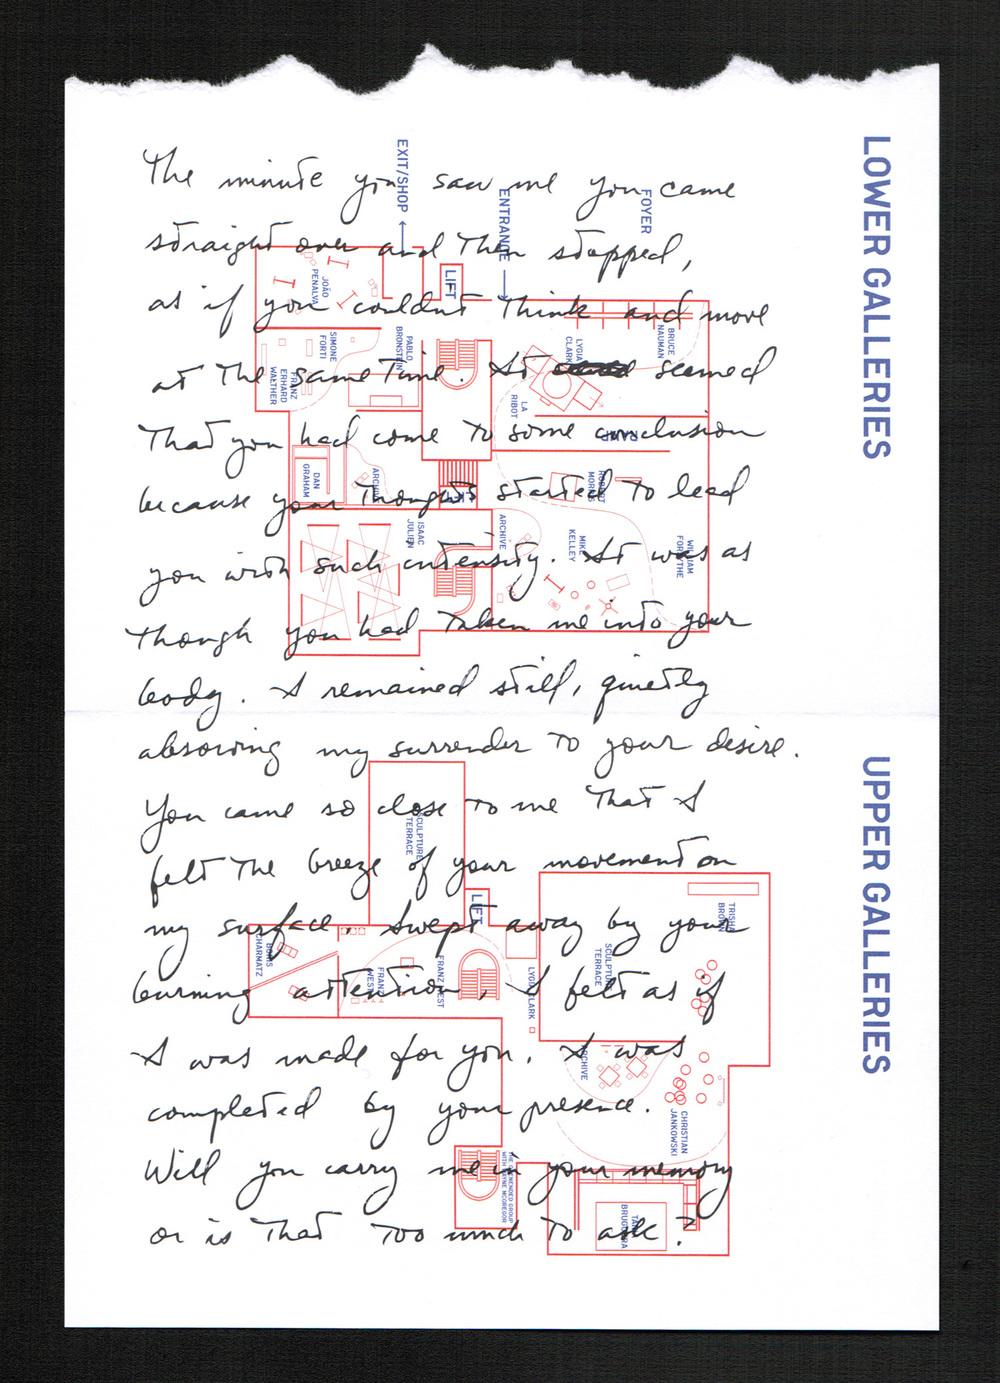 YT_Hayward_Letter_Web.jpg